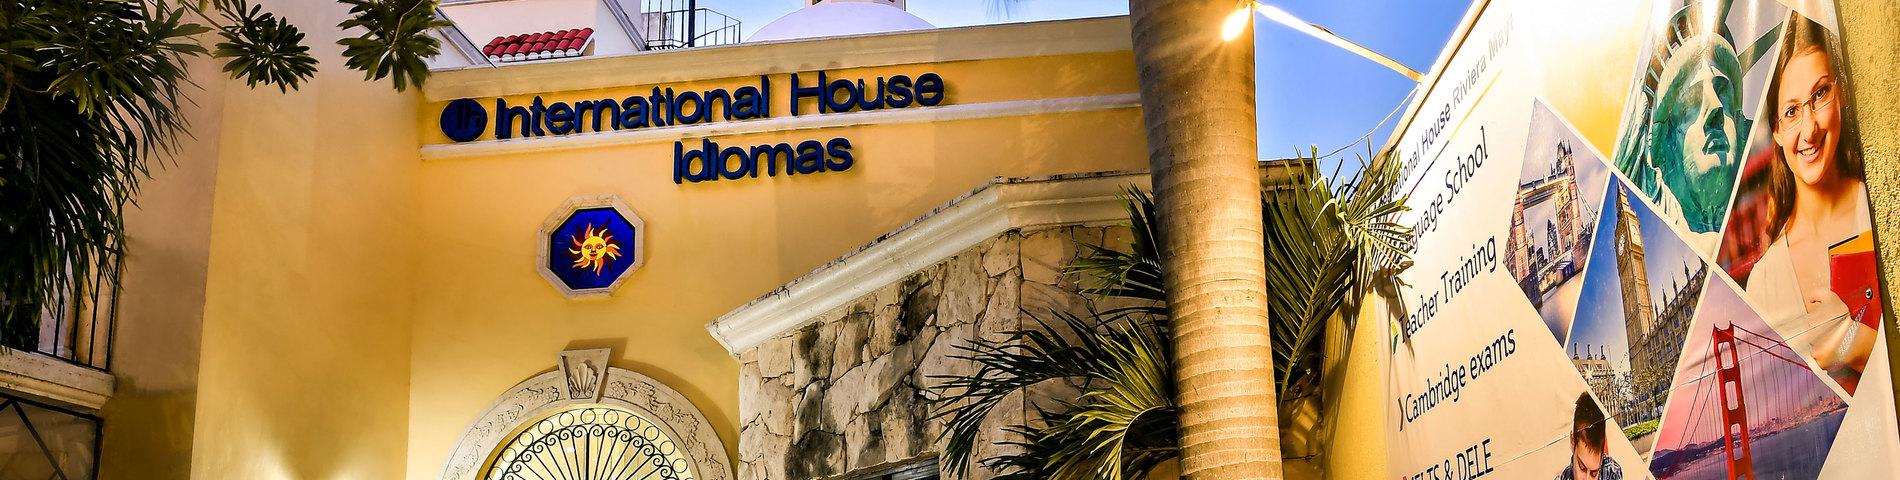 International House - Riviera Maya kép 1